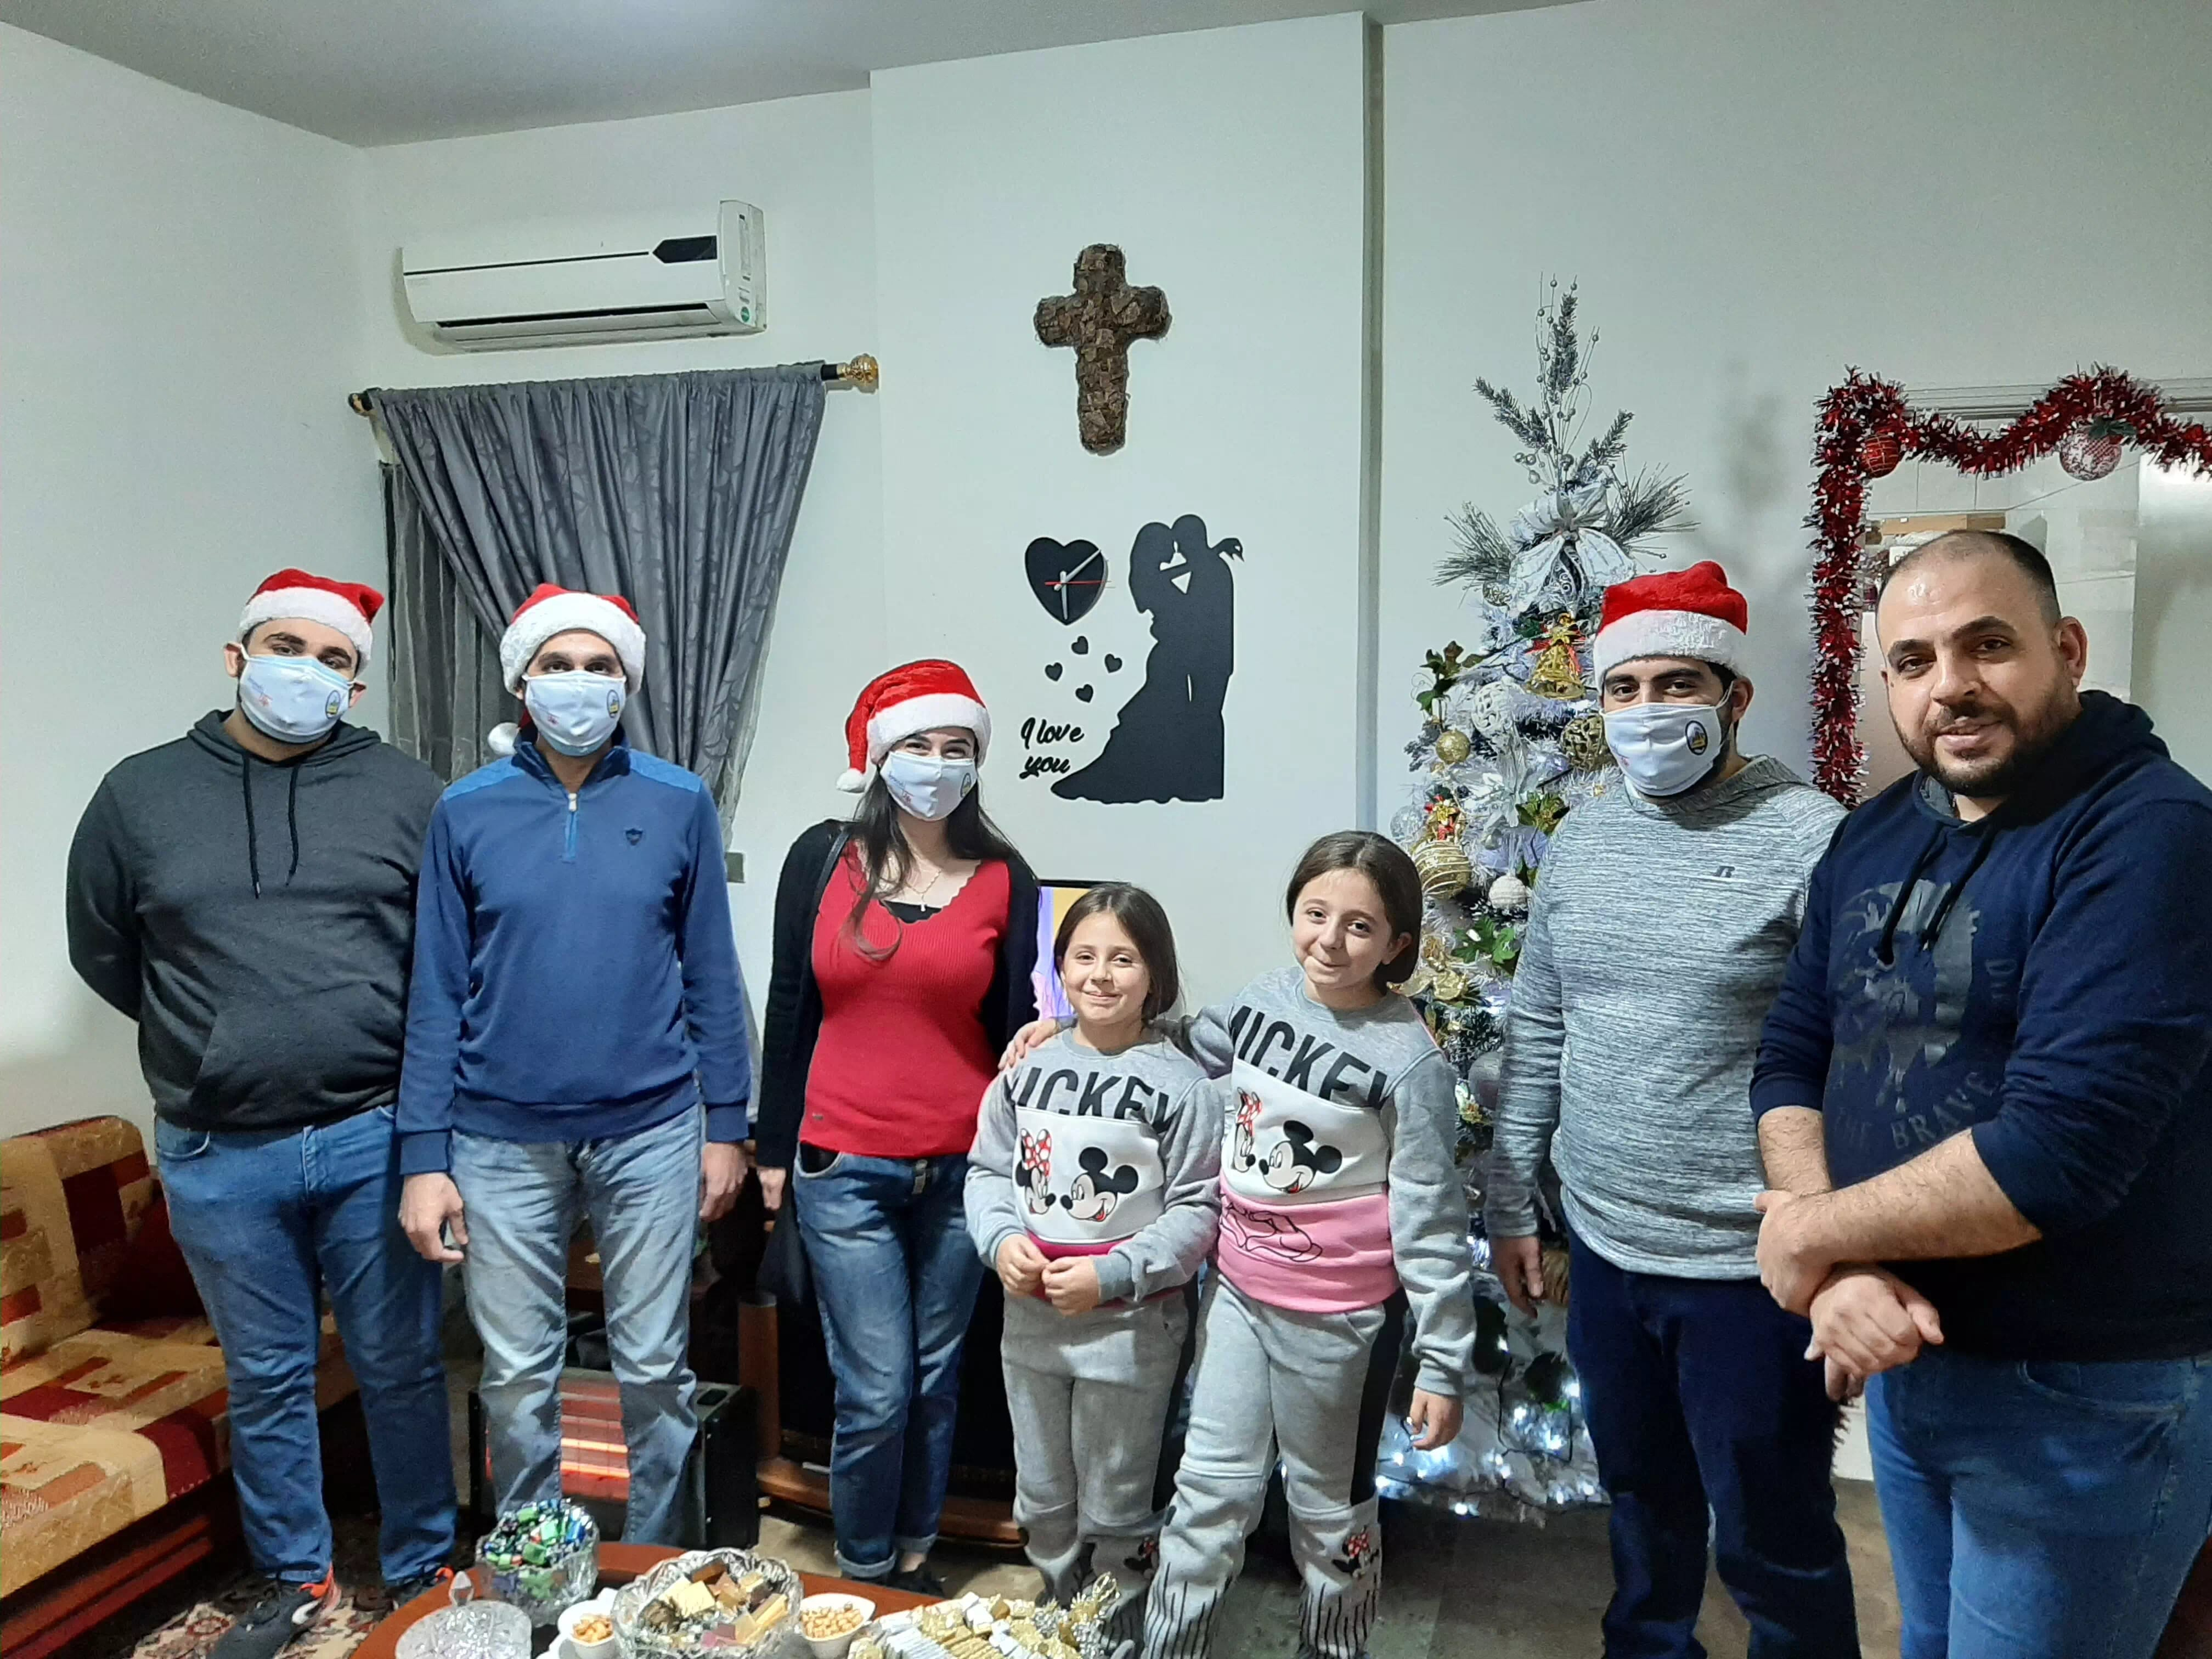 https://eundemia.sirv.com/Images/christmas/456820.webp